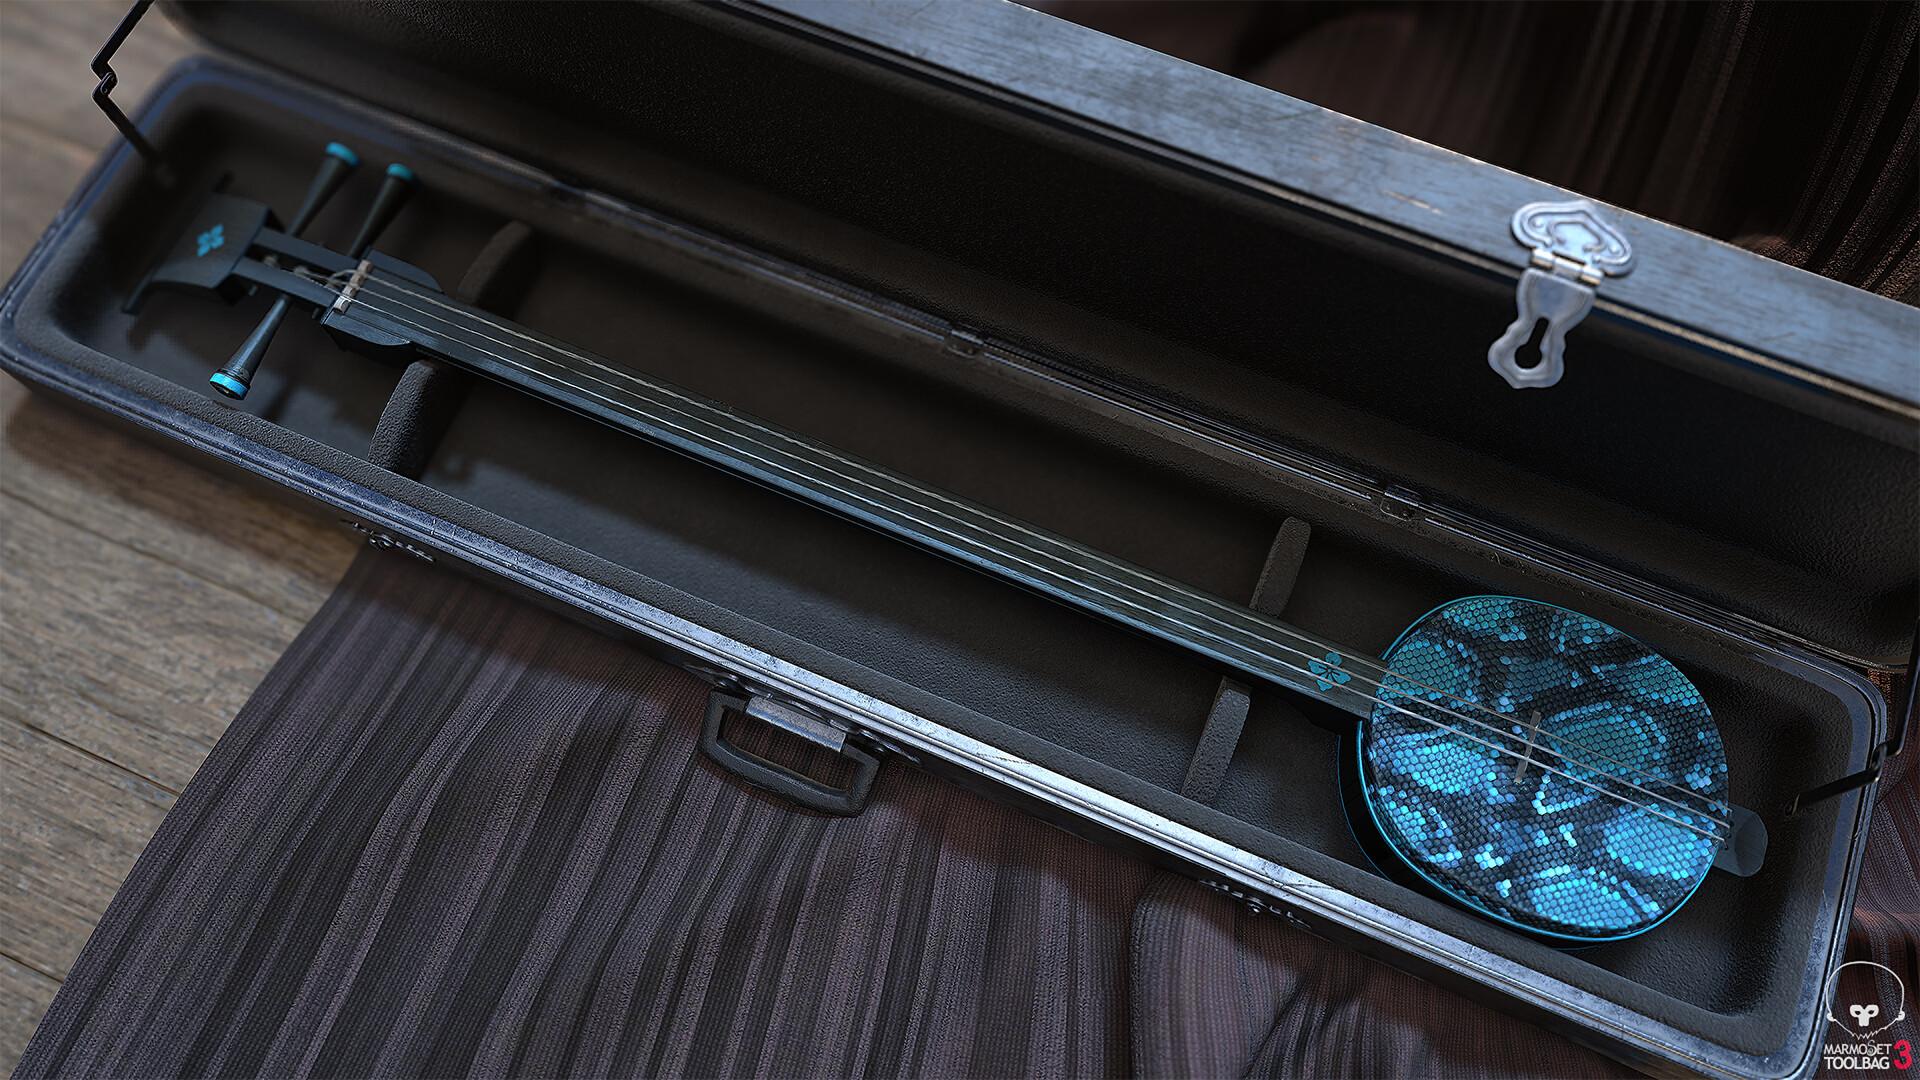 Yumi batgerel 01 0004 shanz01